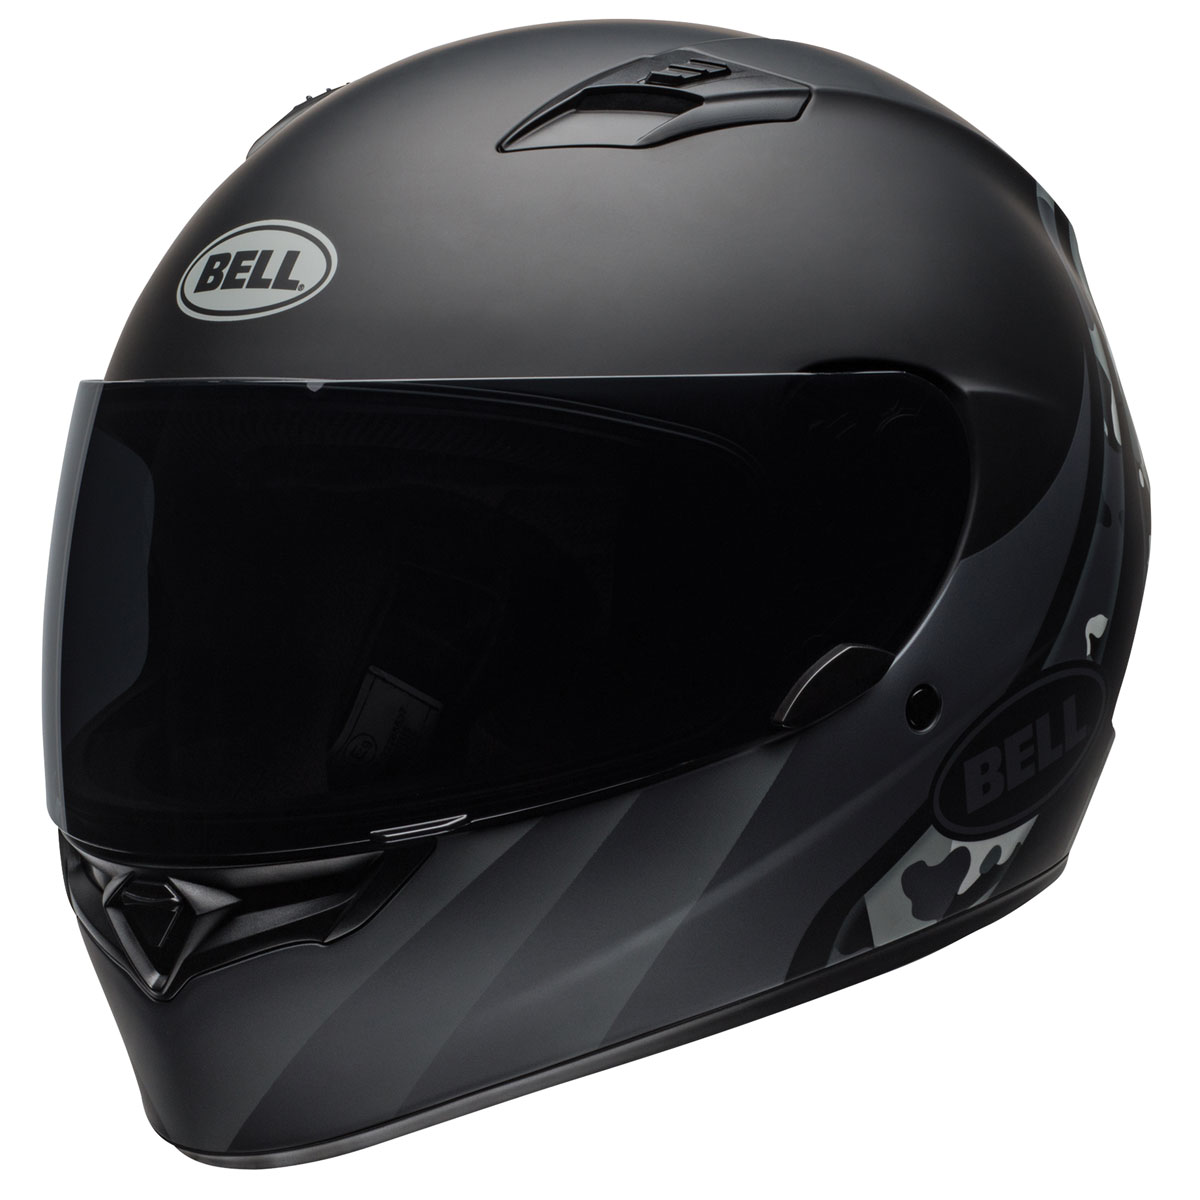 Bell Qualifier Integrity Black/Titanium Full Face Helmet